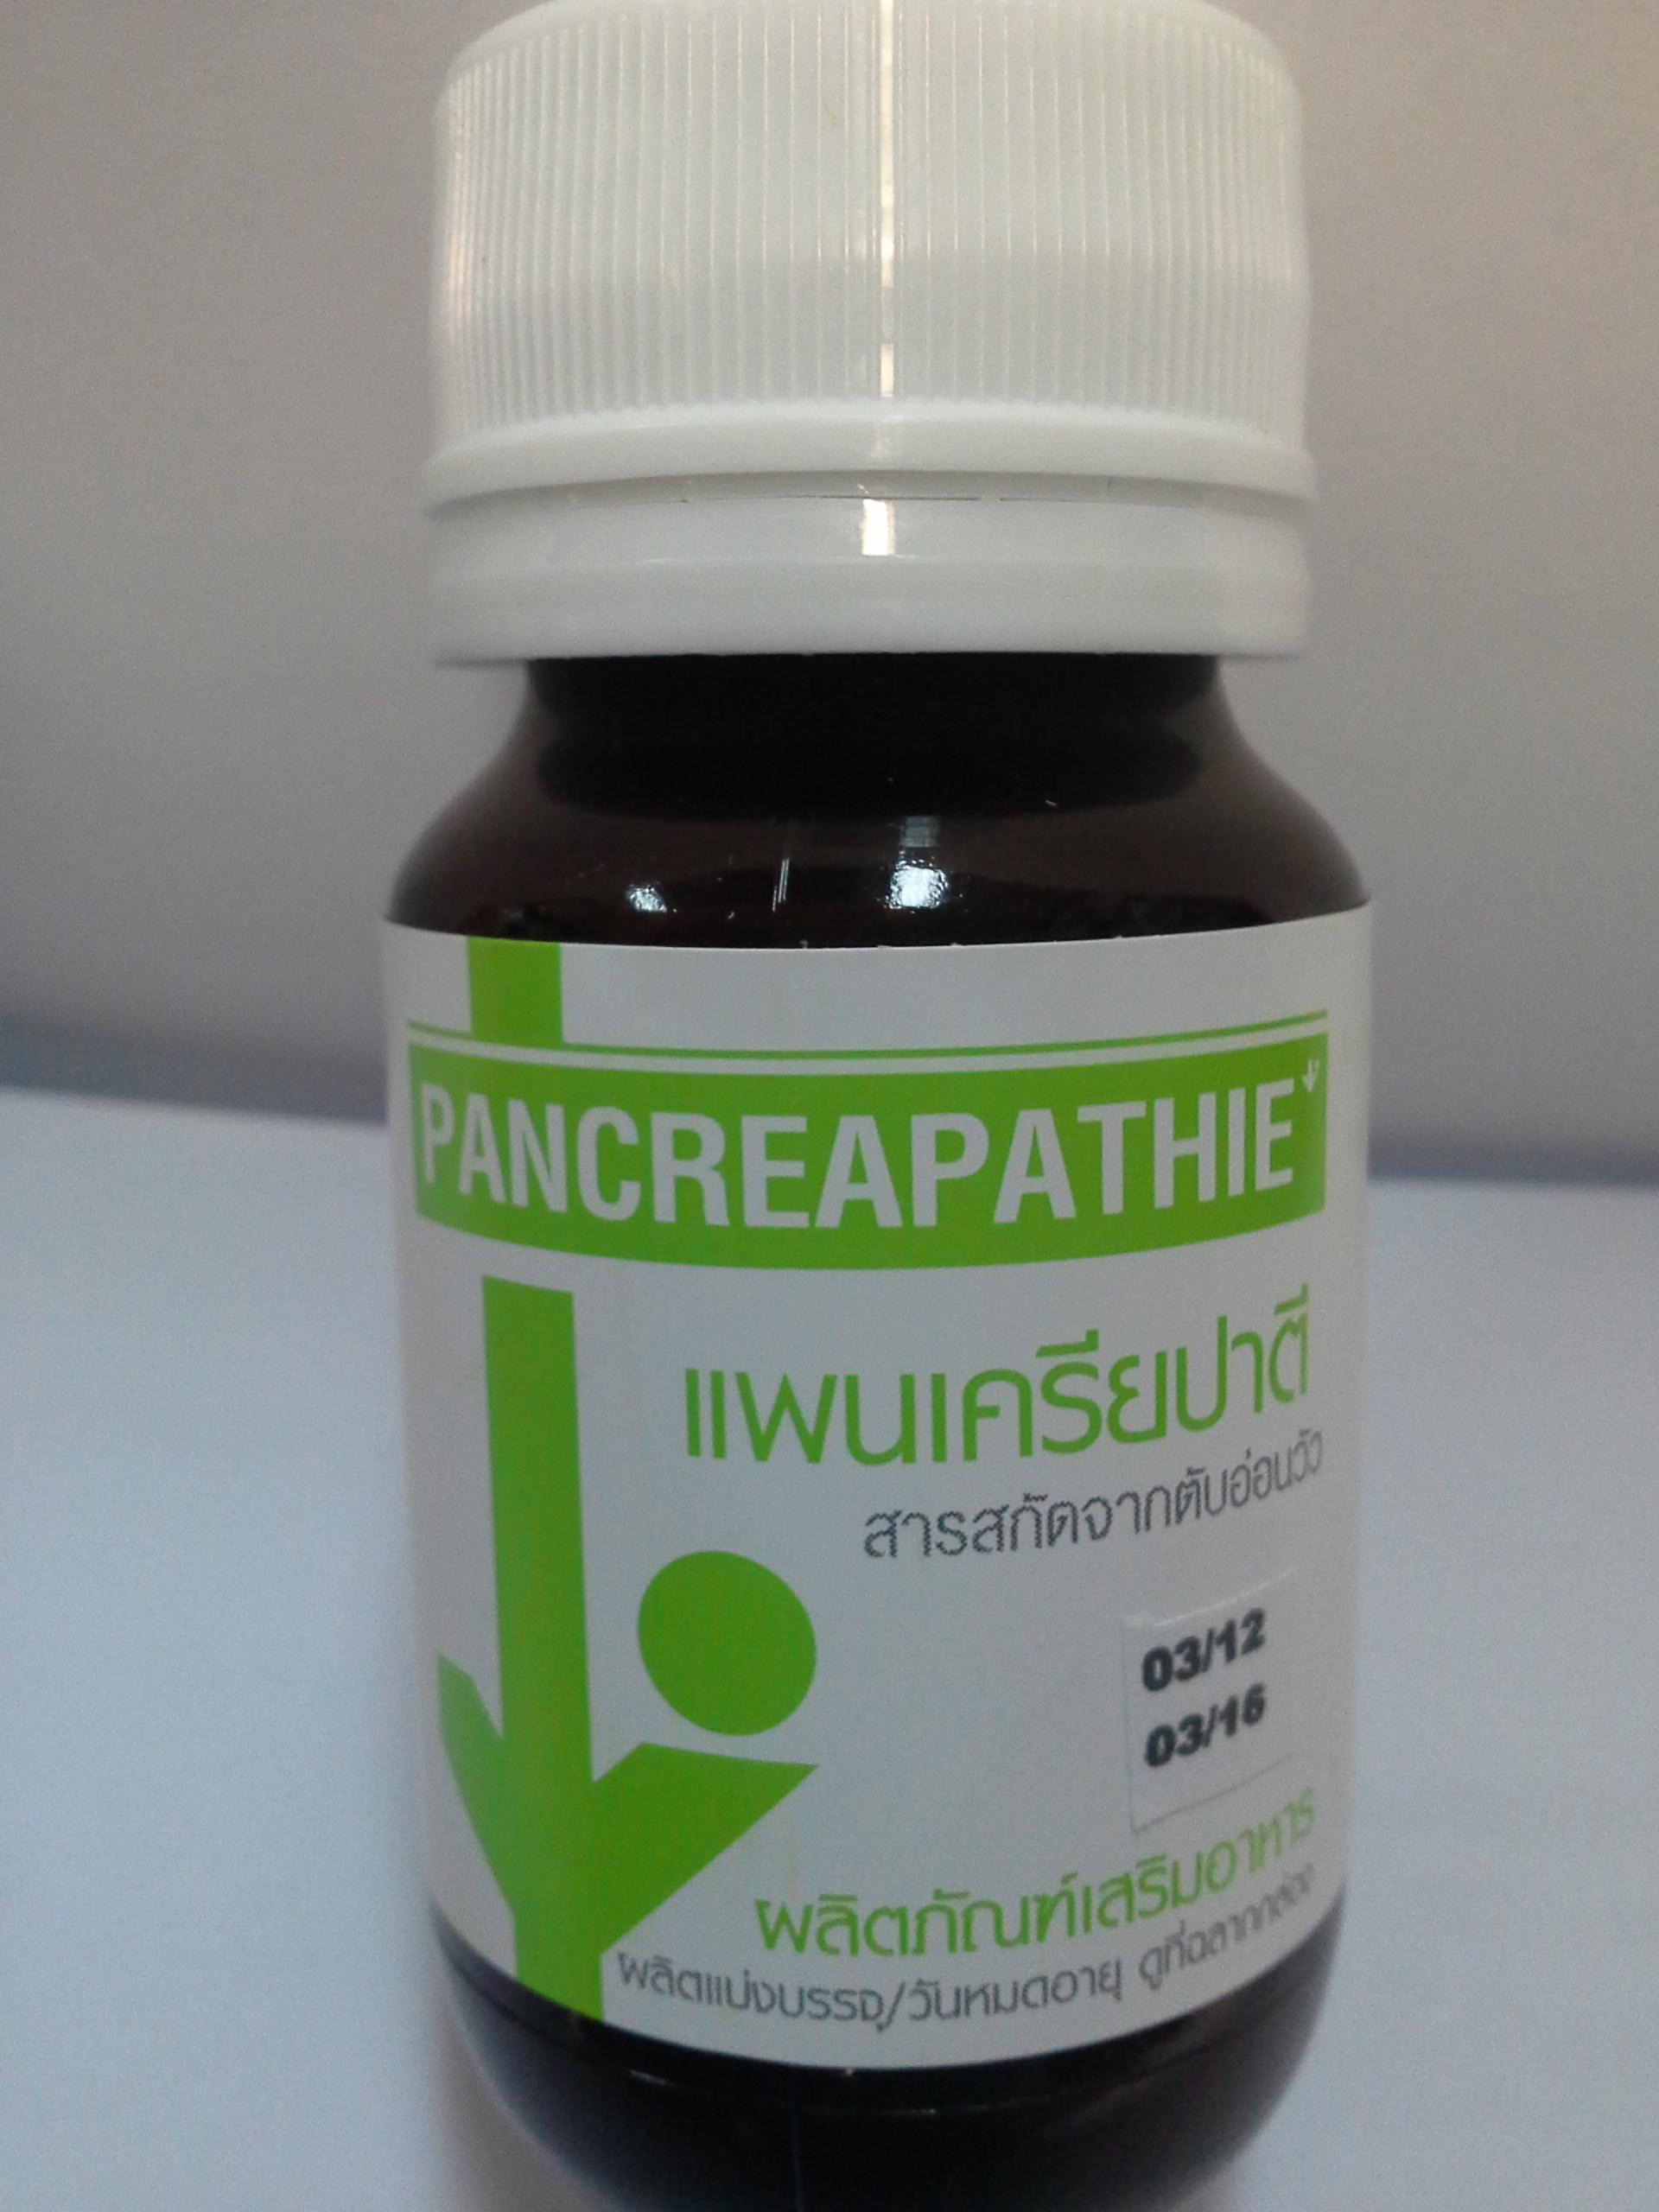 PANCREAPATHIE (แพนเครียปาตี) สารสกัดจากตับอ่อนวัว